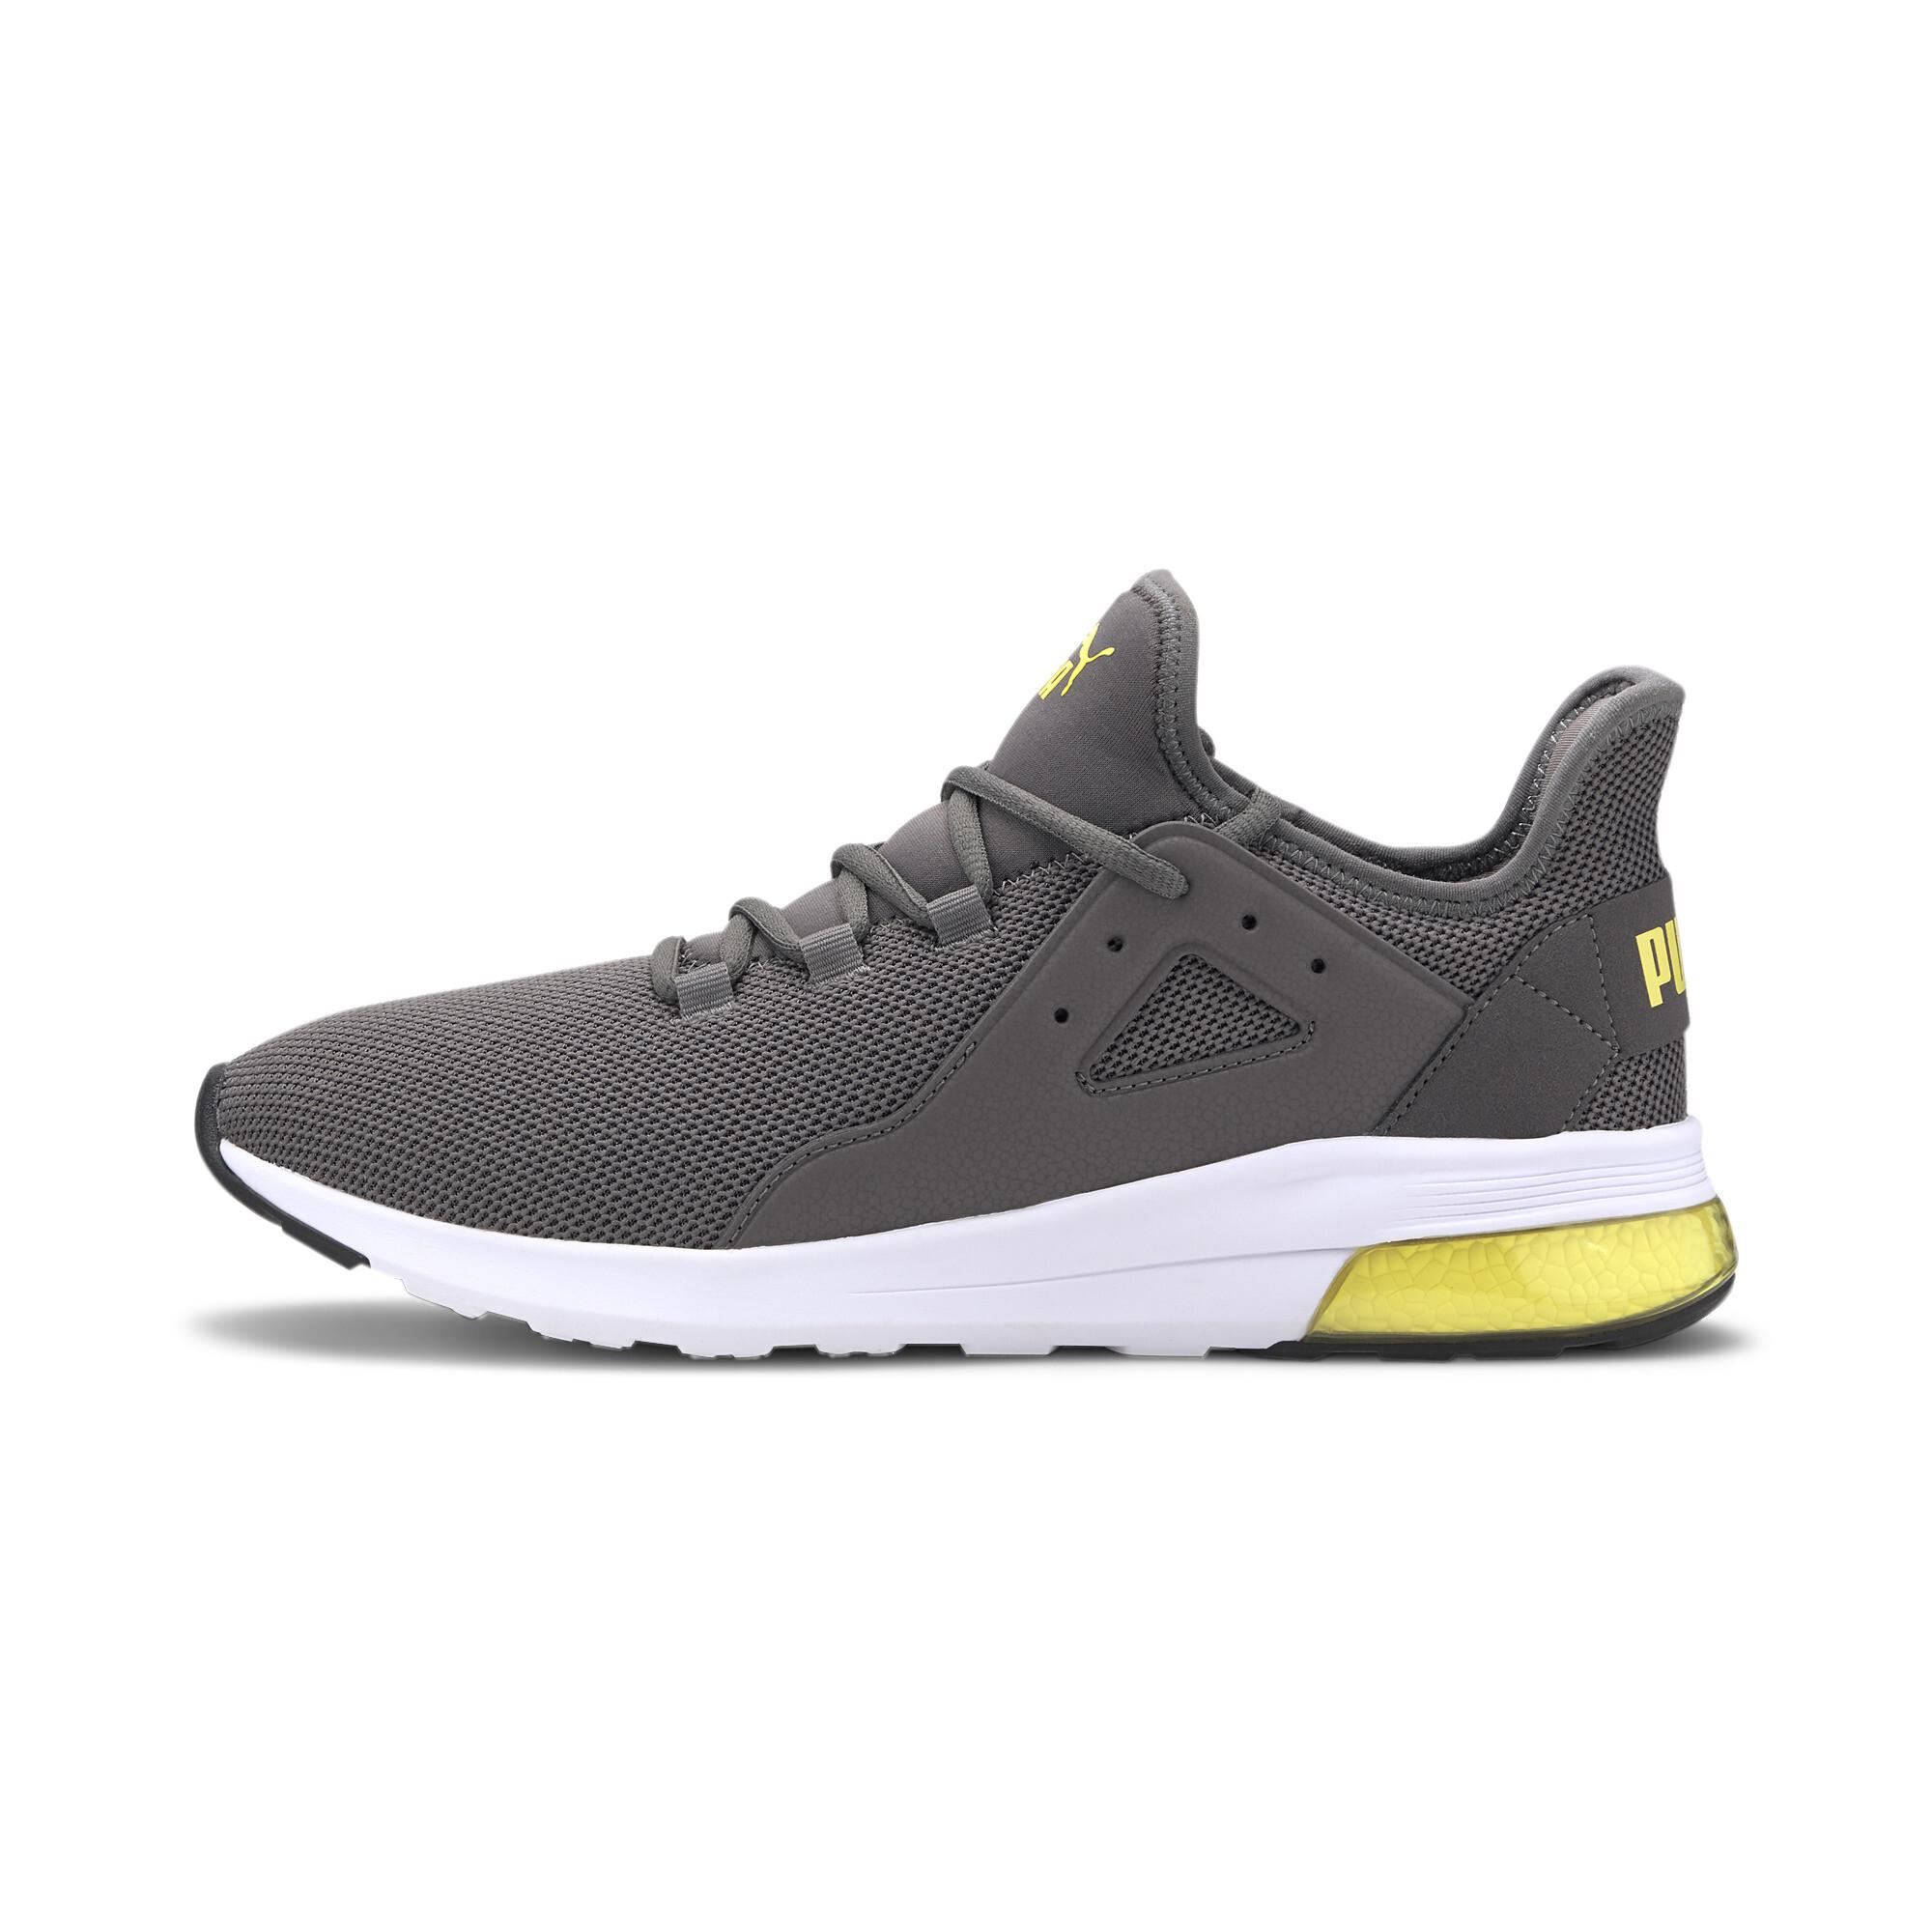 PUMA-Electron-Street-Men-039-s-Sneakers-Men-Shoe-Basics thumbnail 23